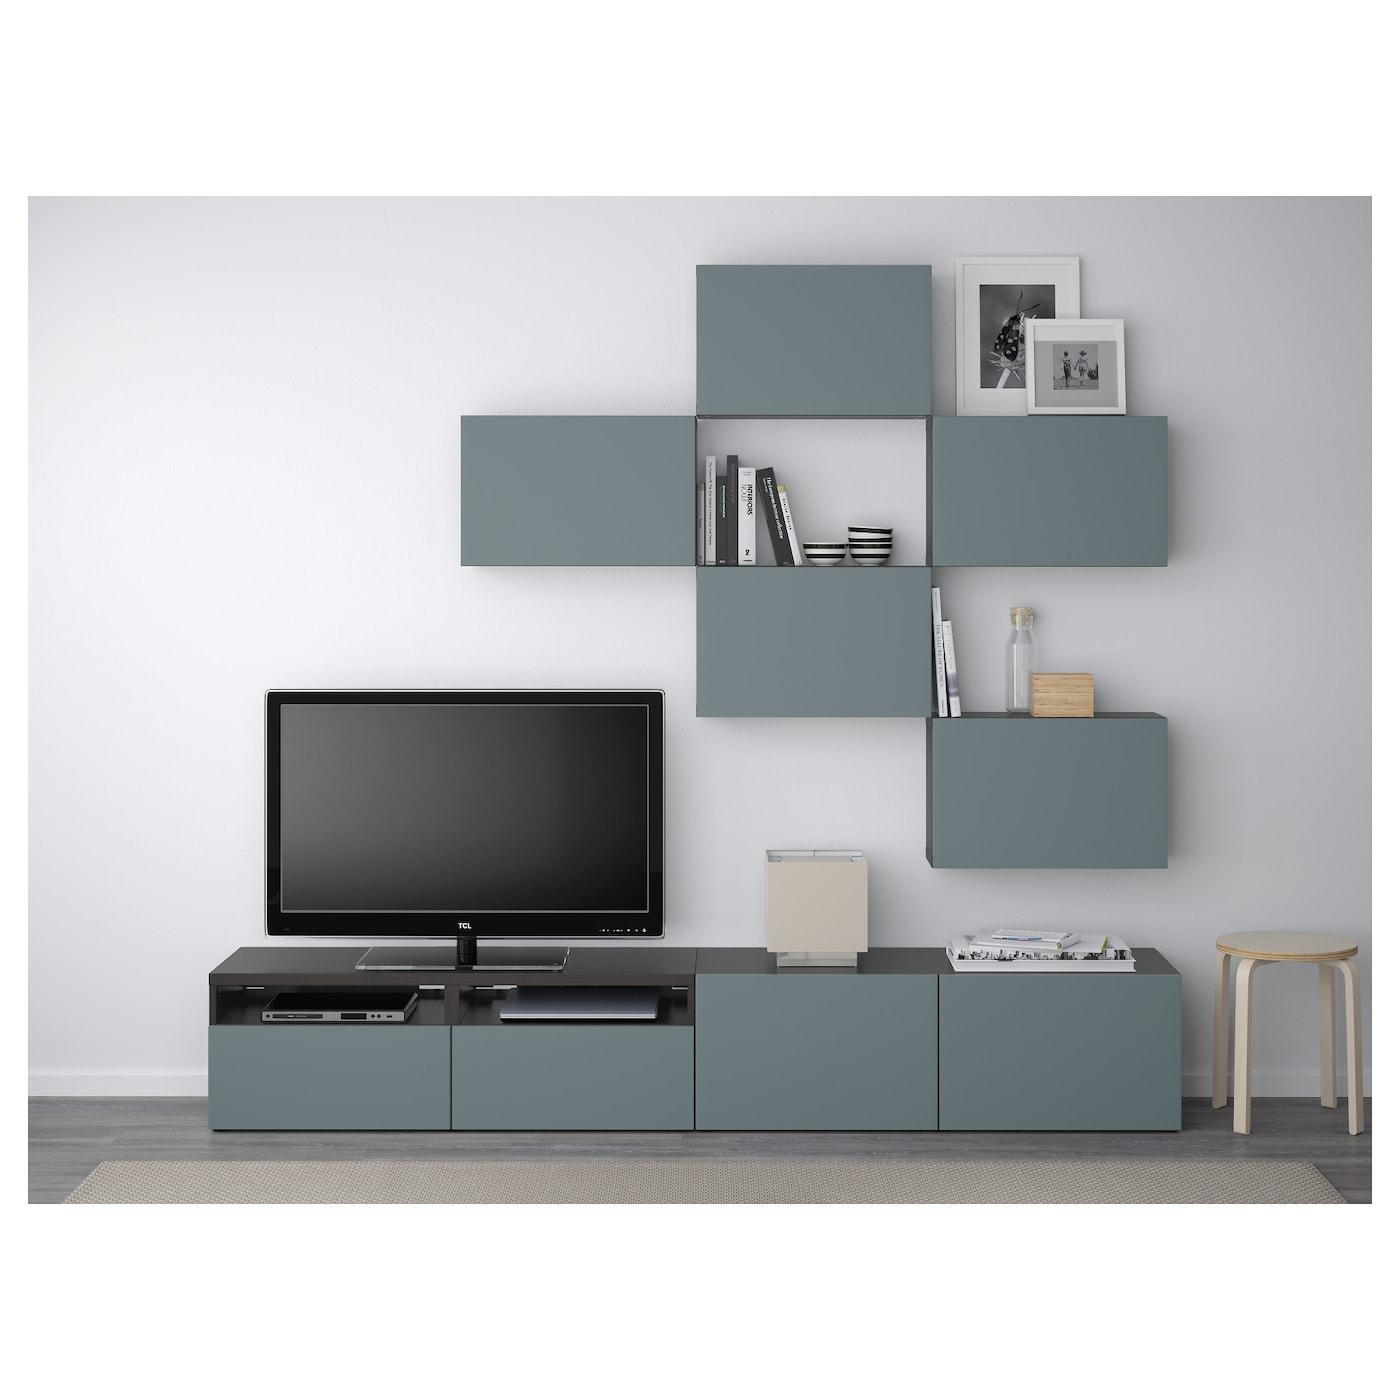 Best Combinaison Meuble Tv Brun Noir Valviken Gris Turquoise  # Meuble Tv Noir Ikea